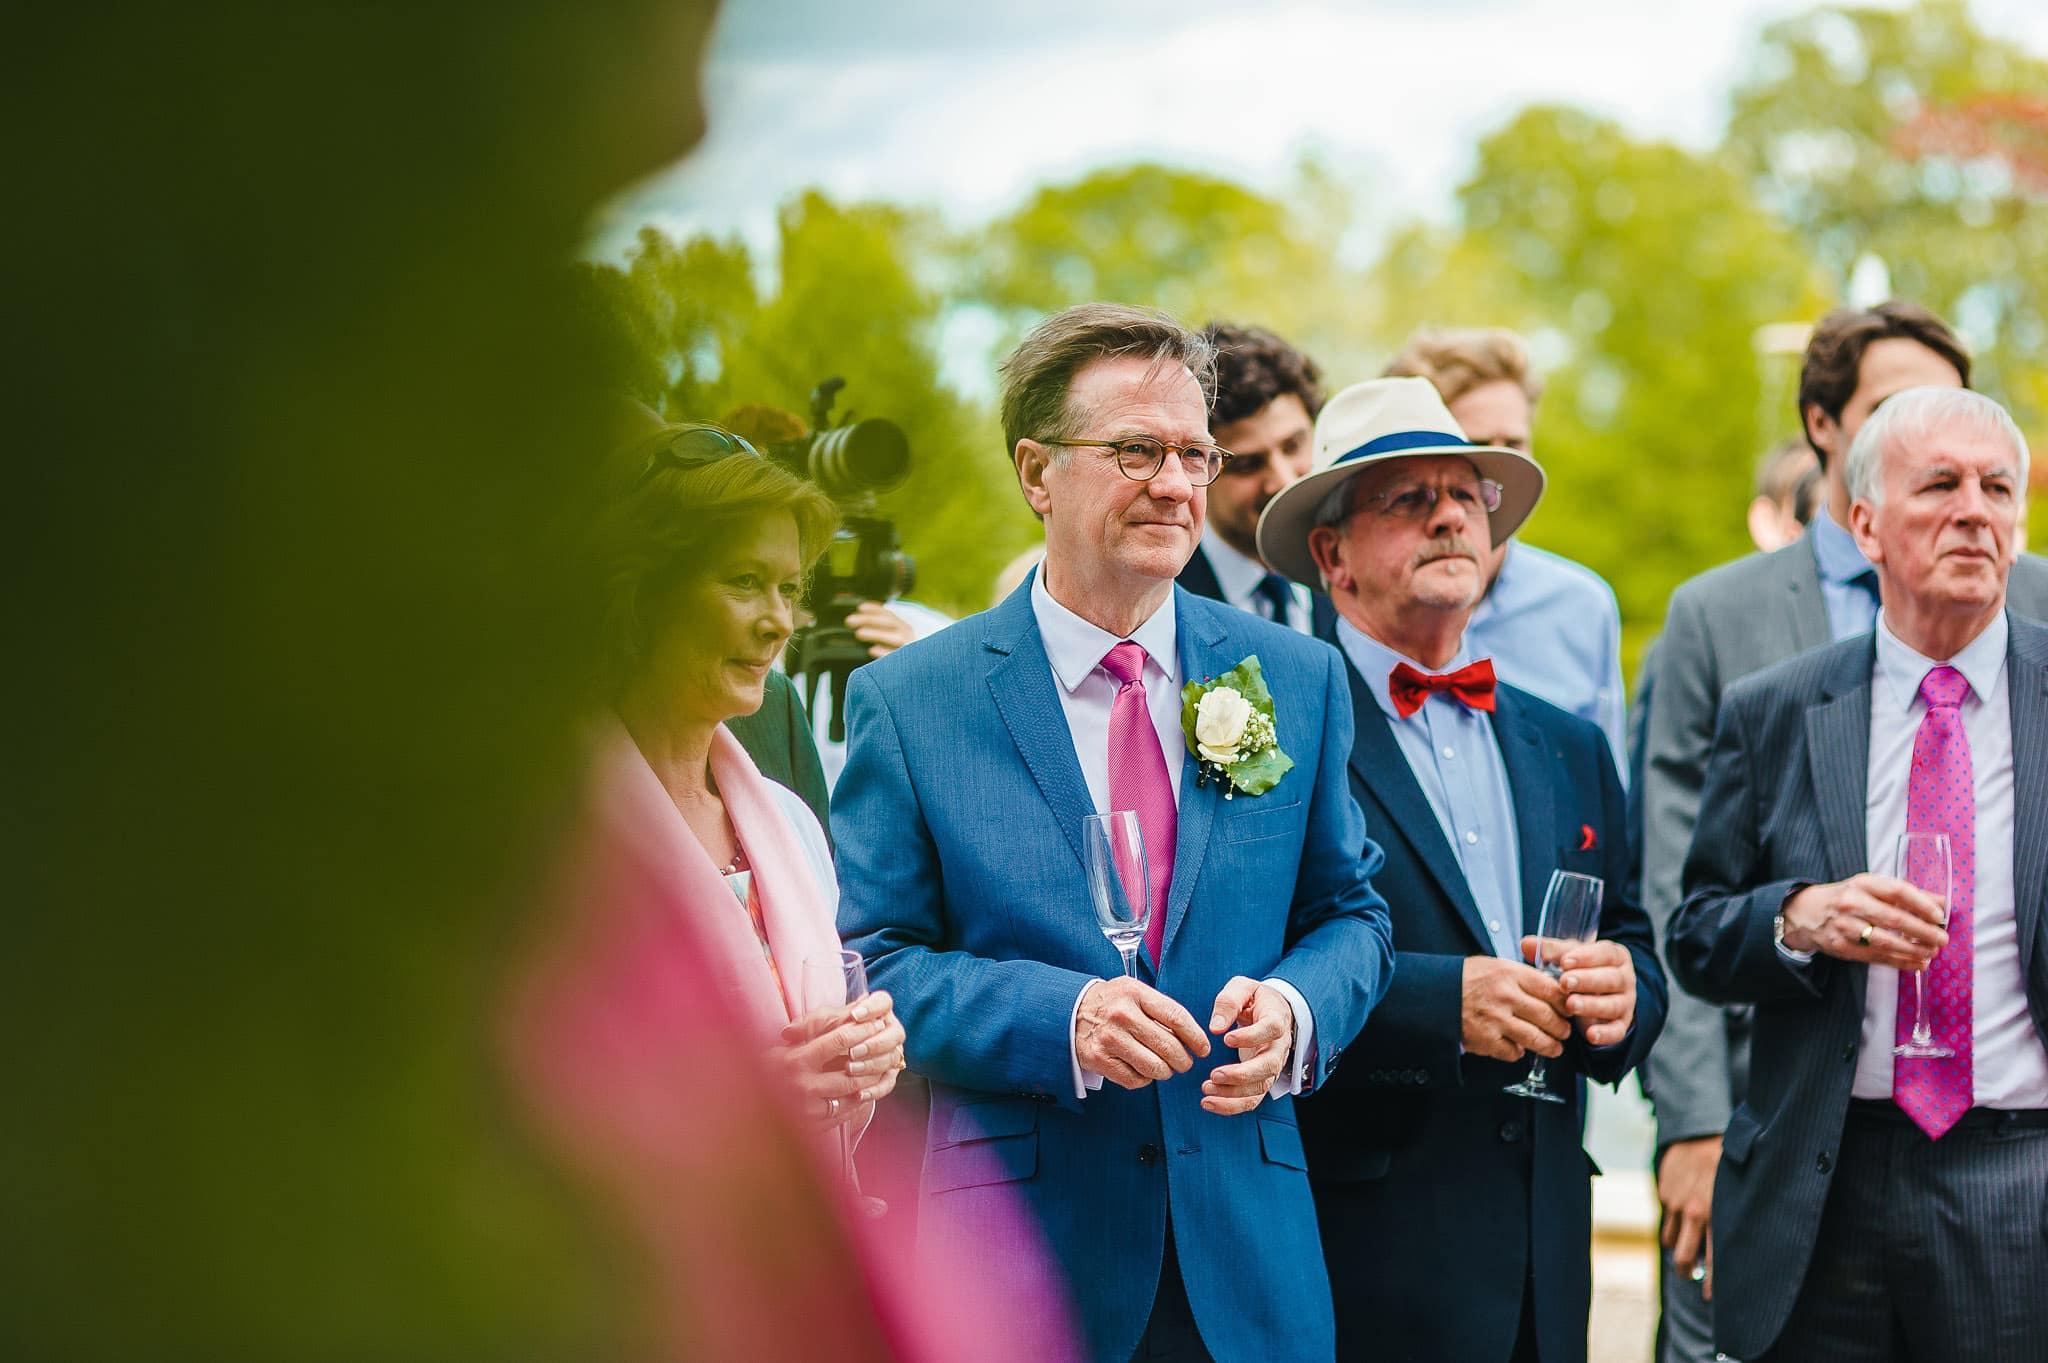 Lemore Manor Wedding Photographer | Hannah and Angus 44